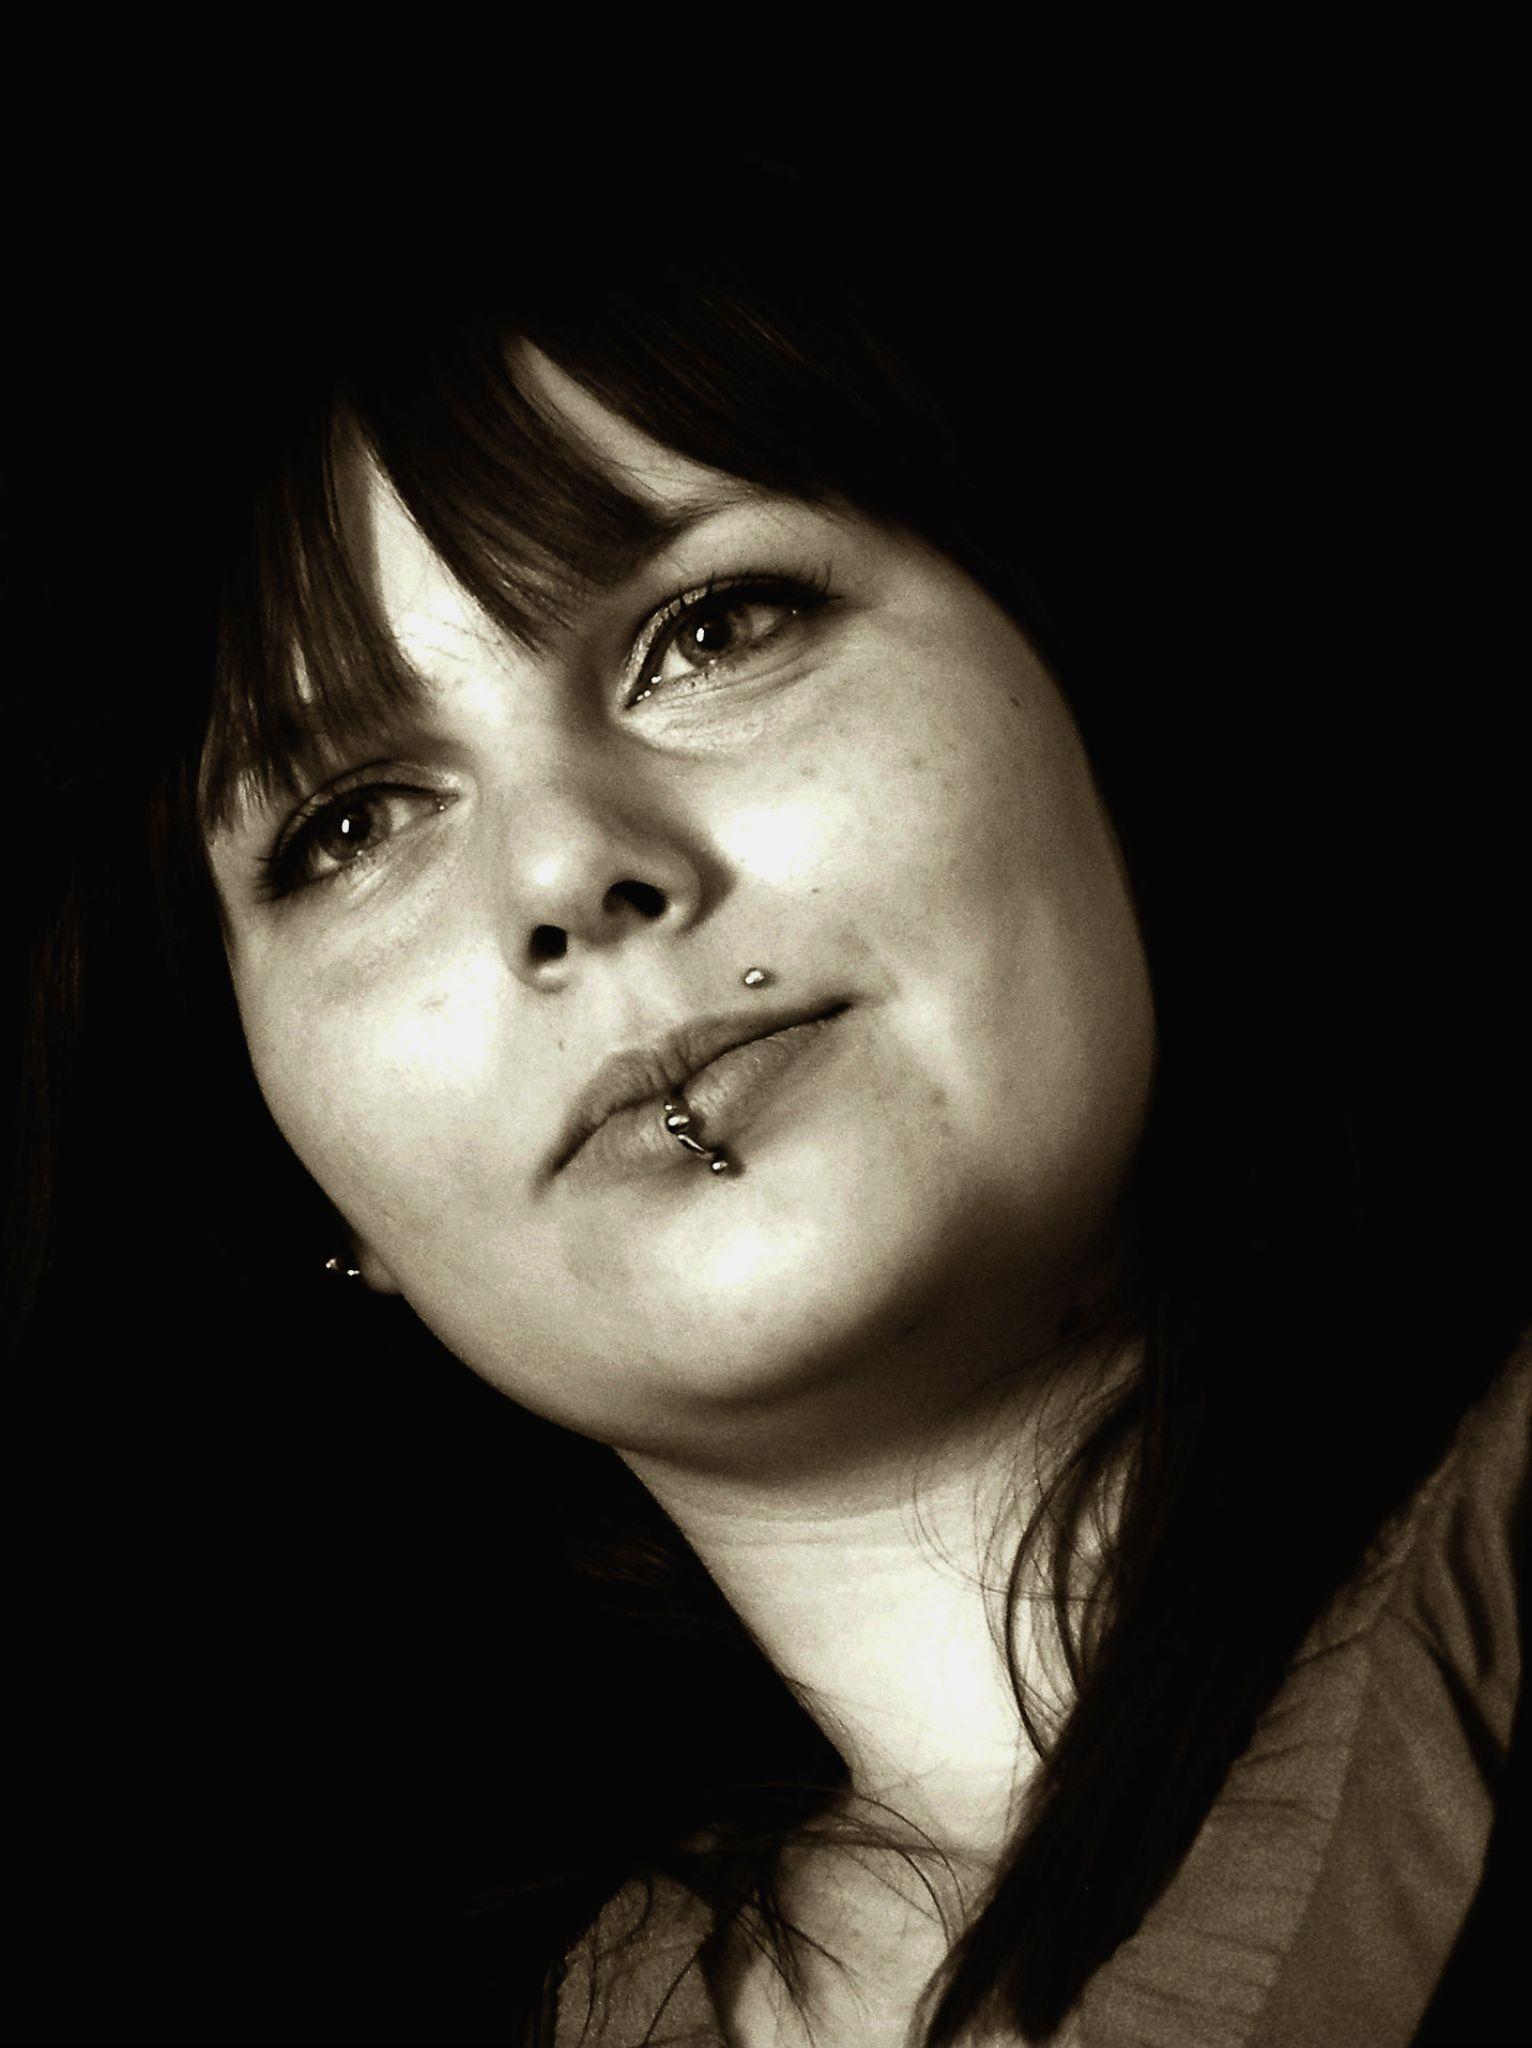 Portrait of a Friend 2 by Kate Ali